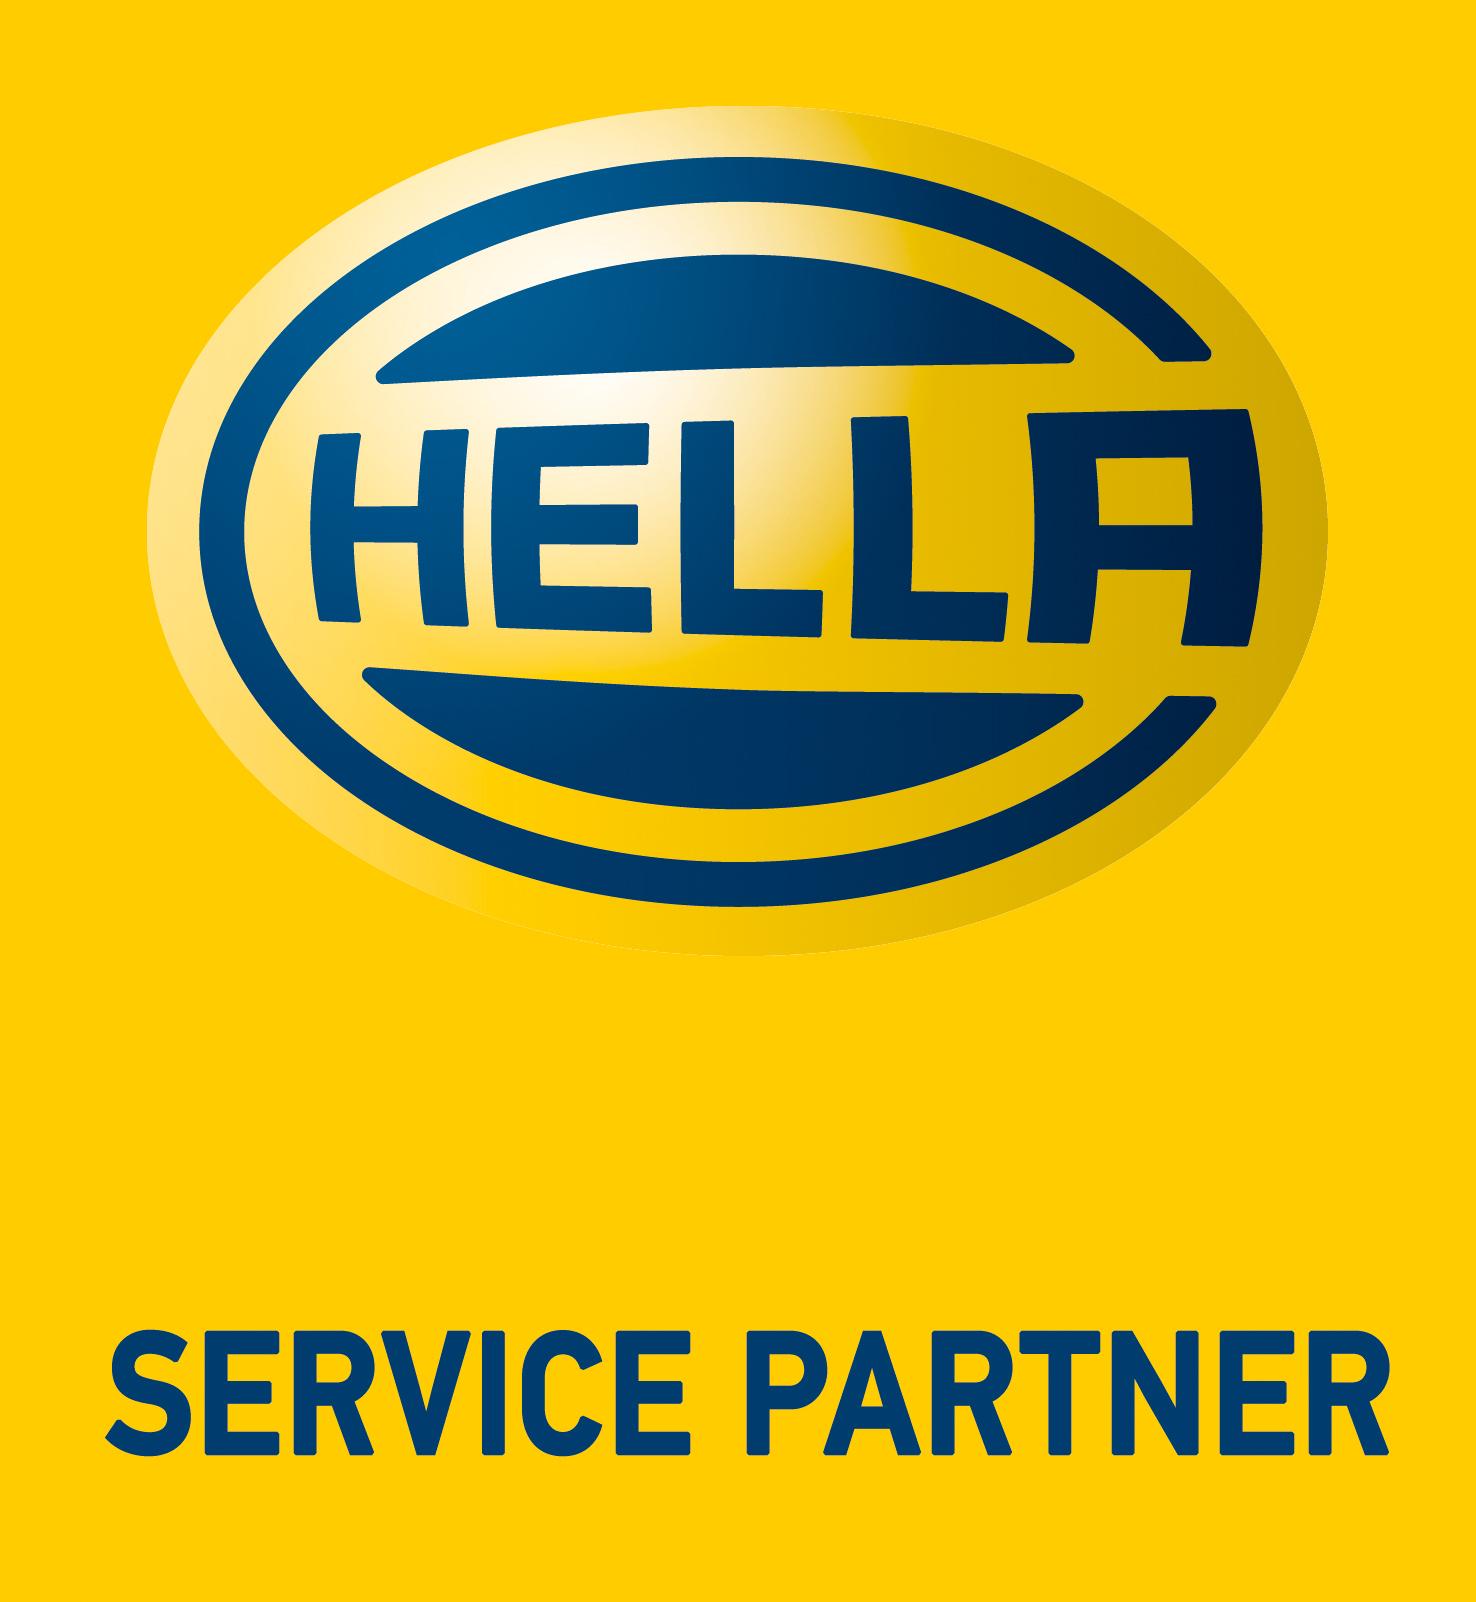 PJ Auto A/S - Hella Service Partner logo